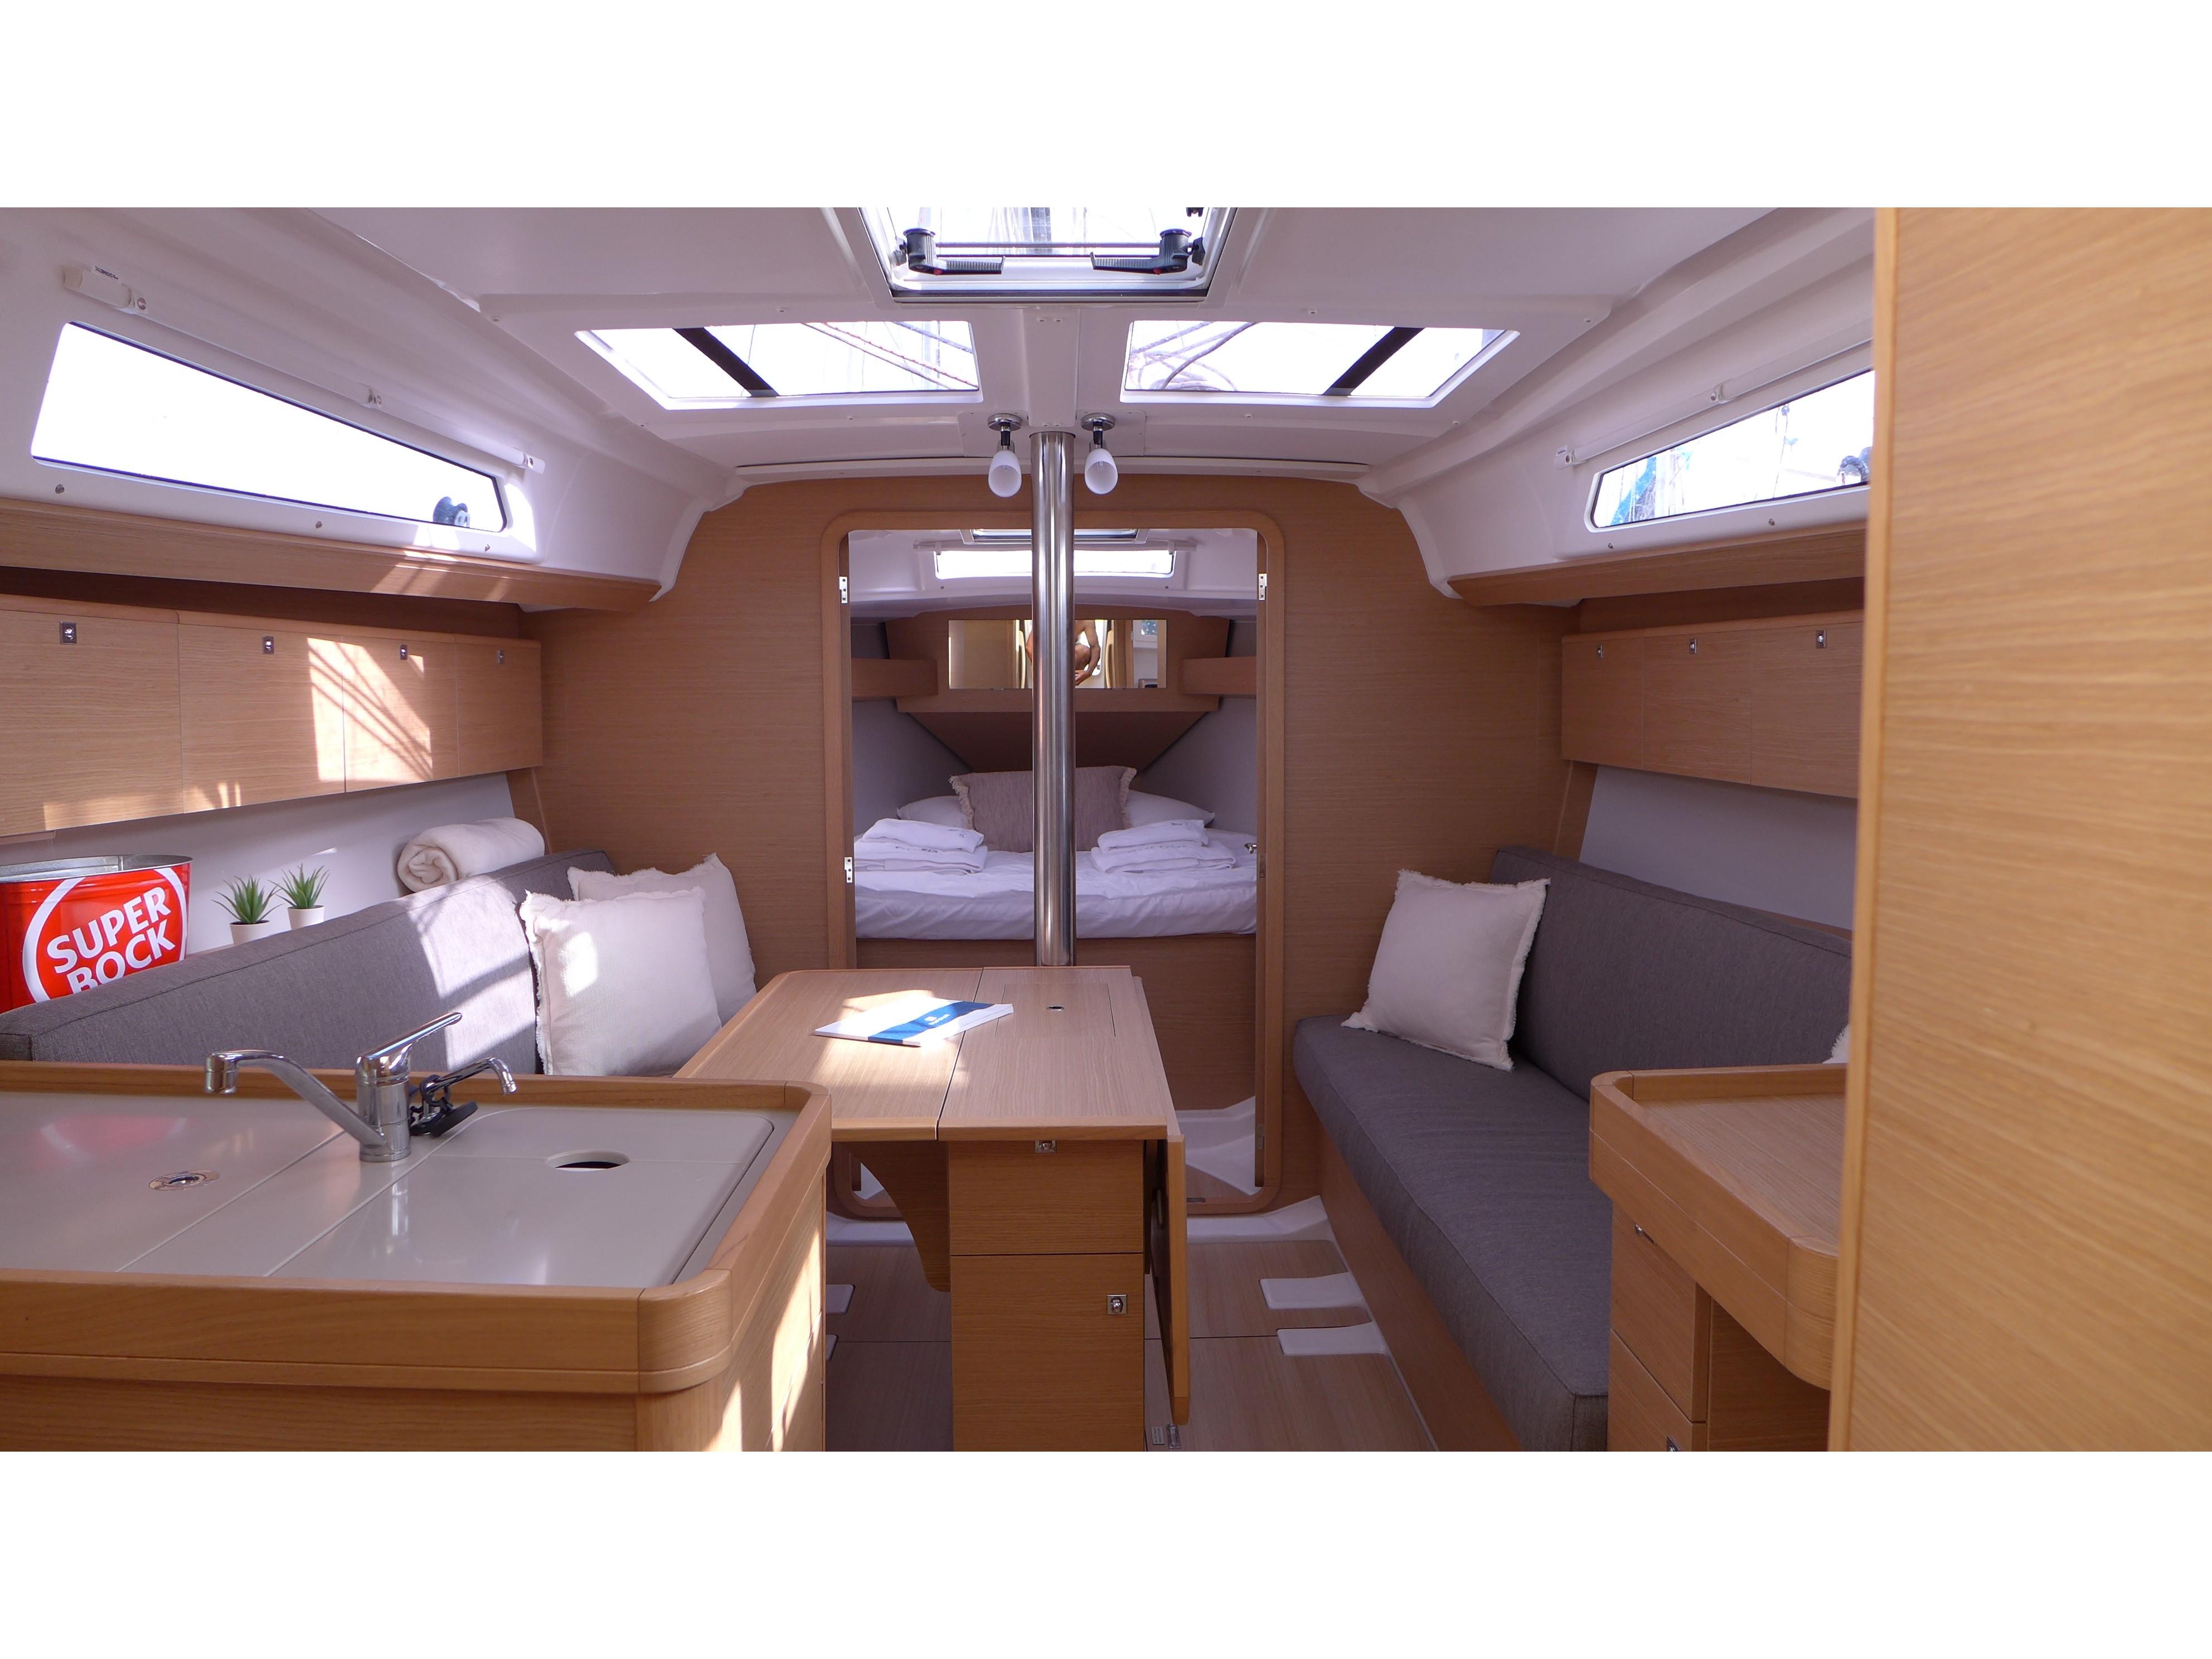 Dufour 360 (Mar me Quer) Interior image - 2